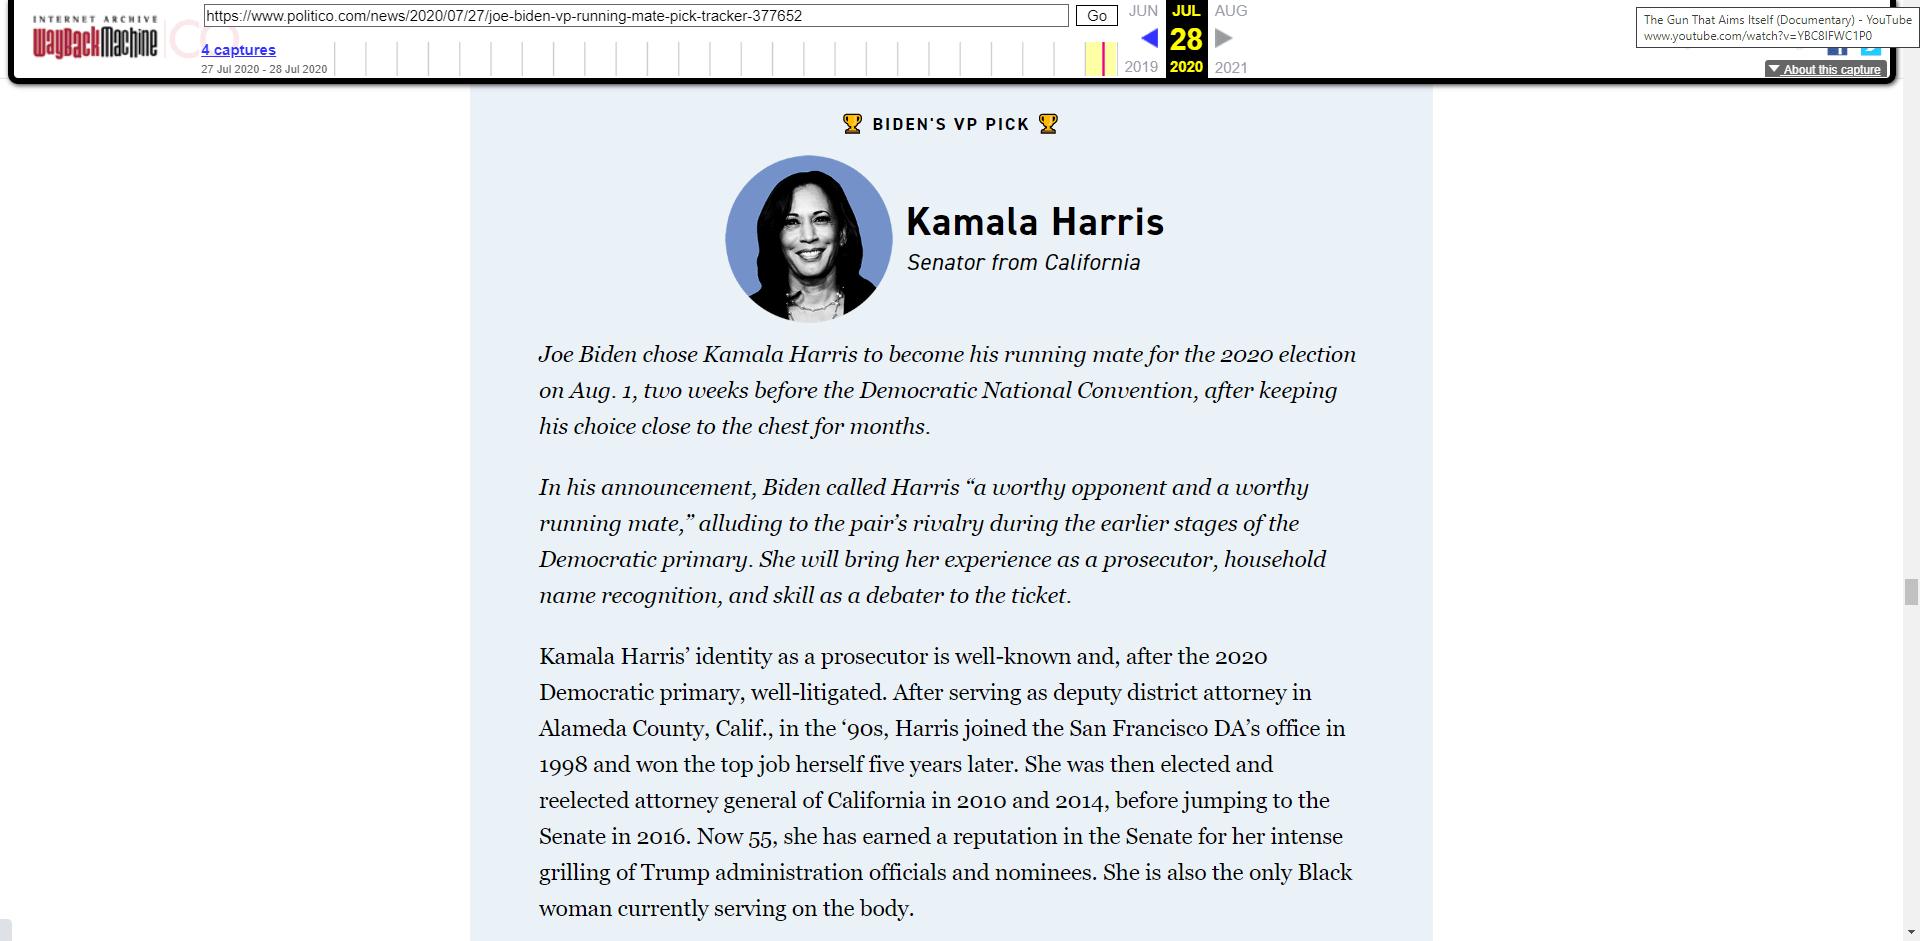 POLITICO Kamala Harris BIDEN VP PICK